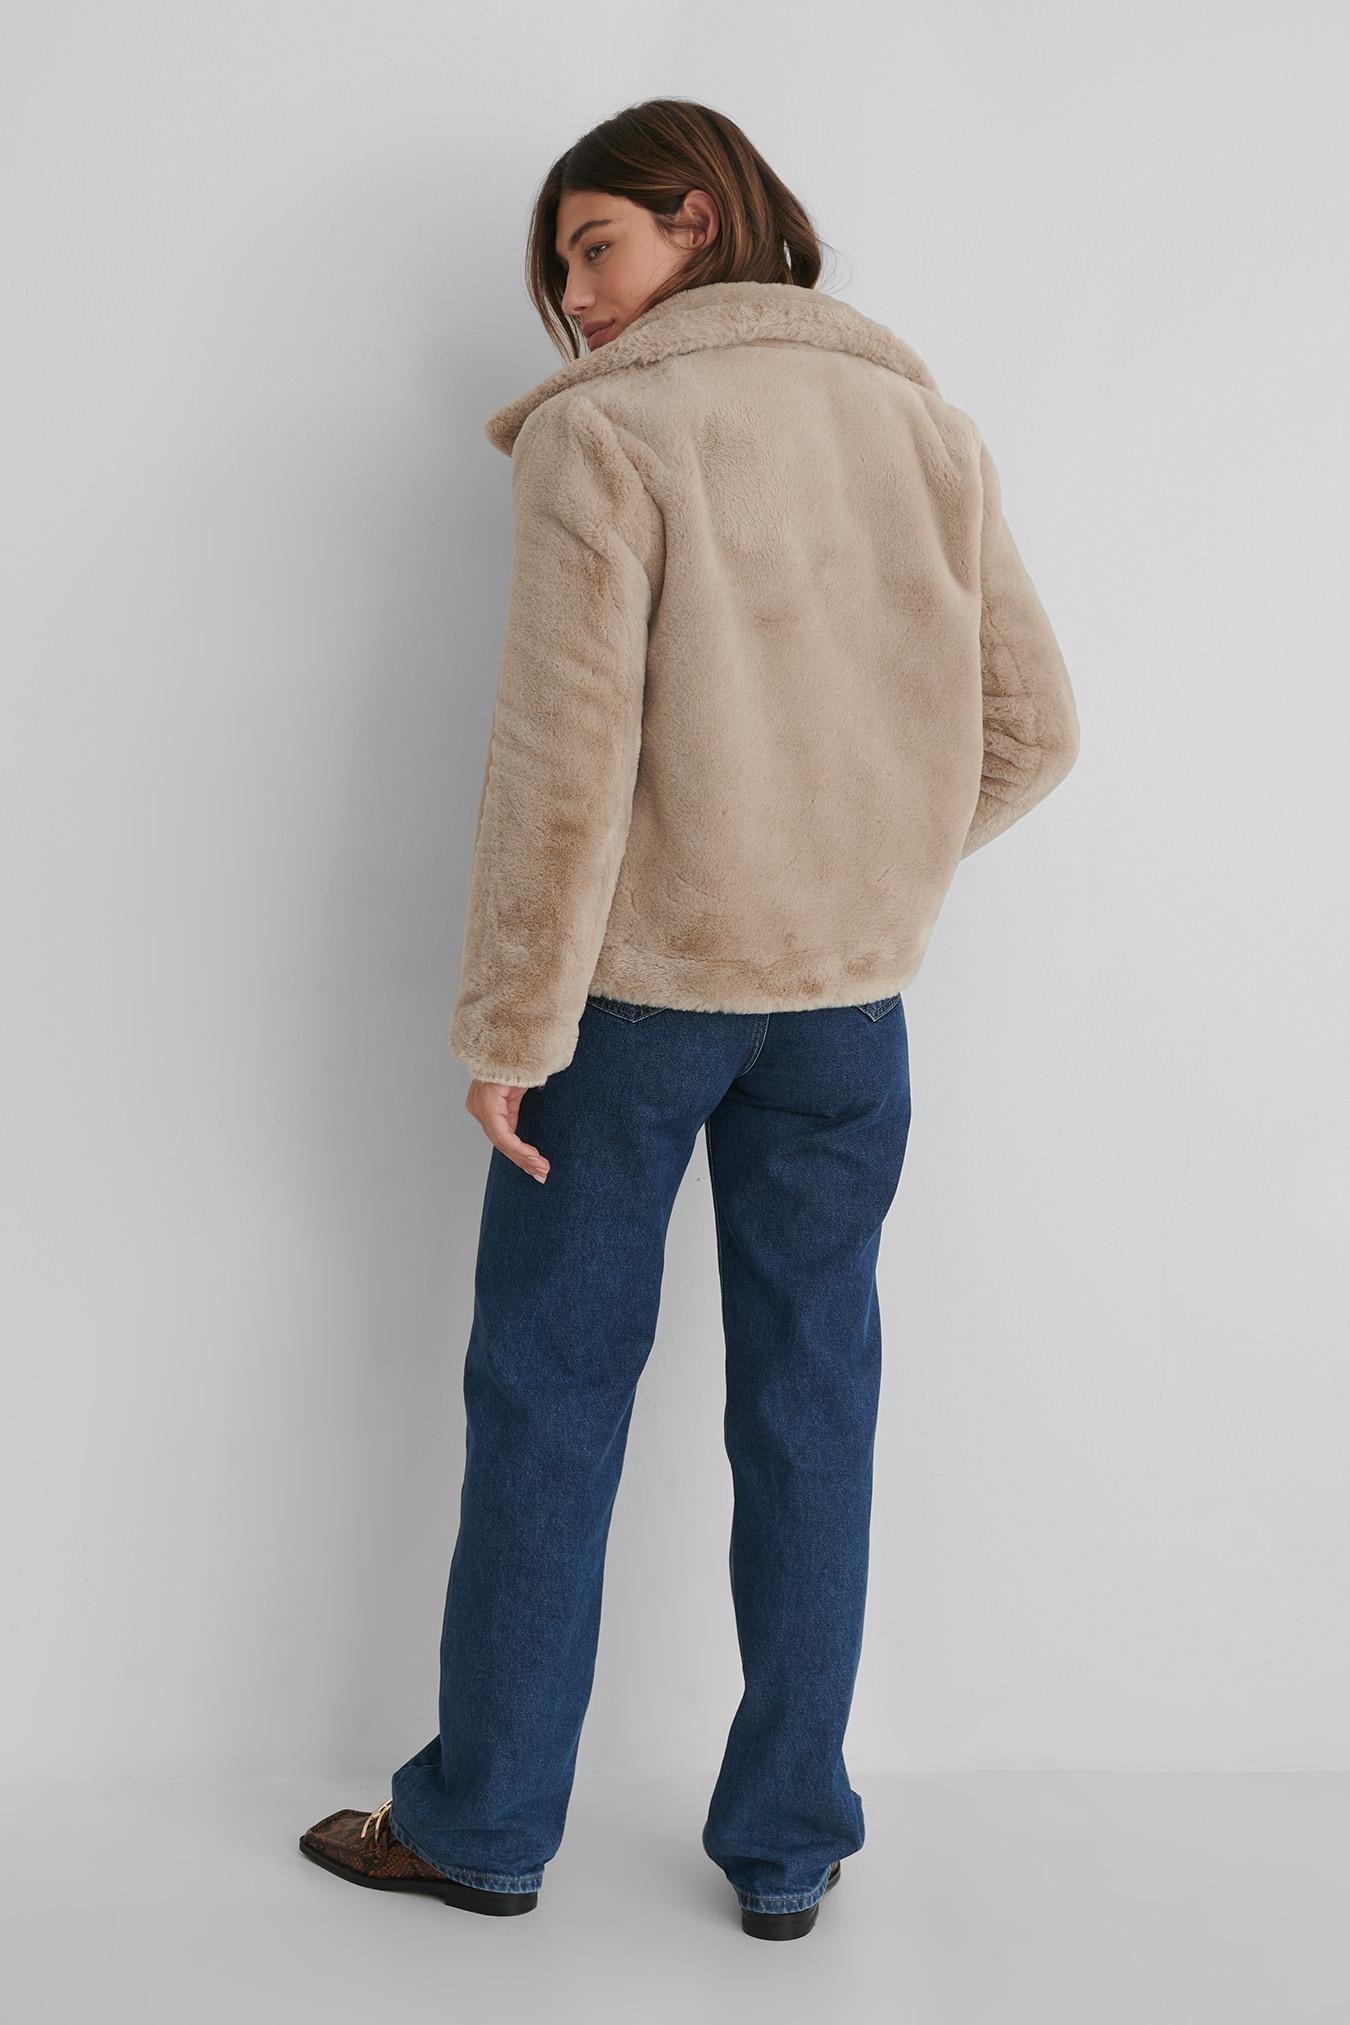 Woodi Coat Beige   na-kd.com